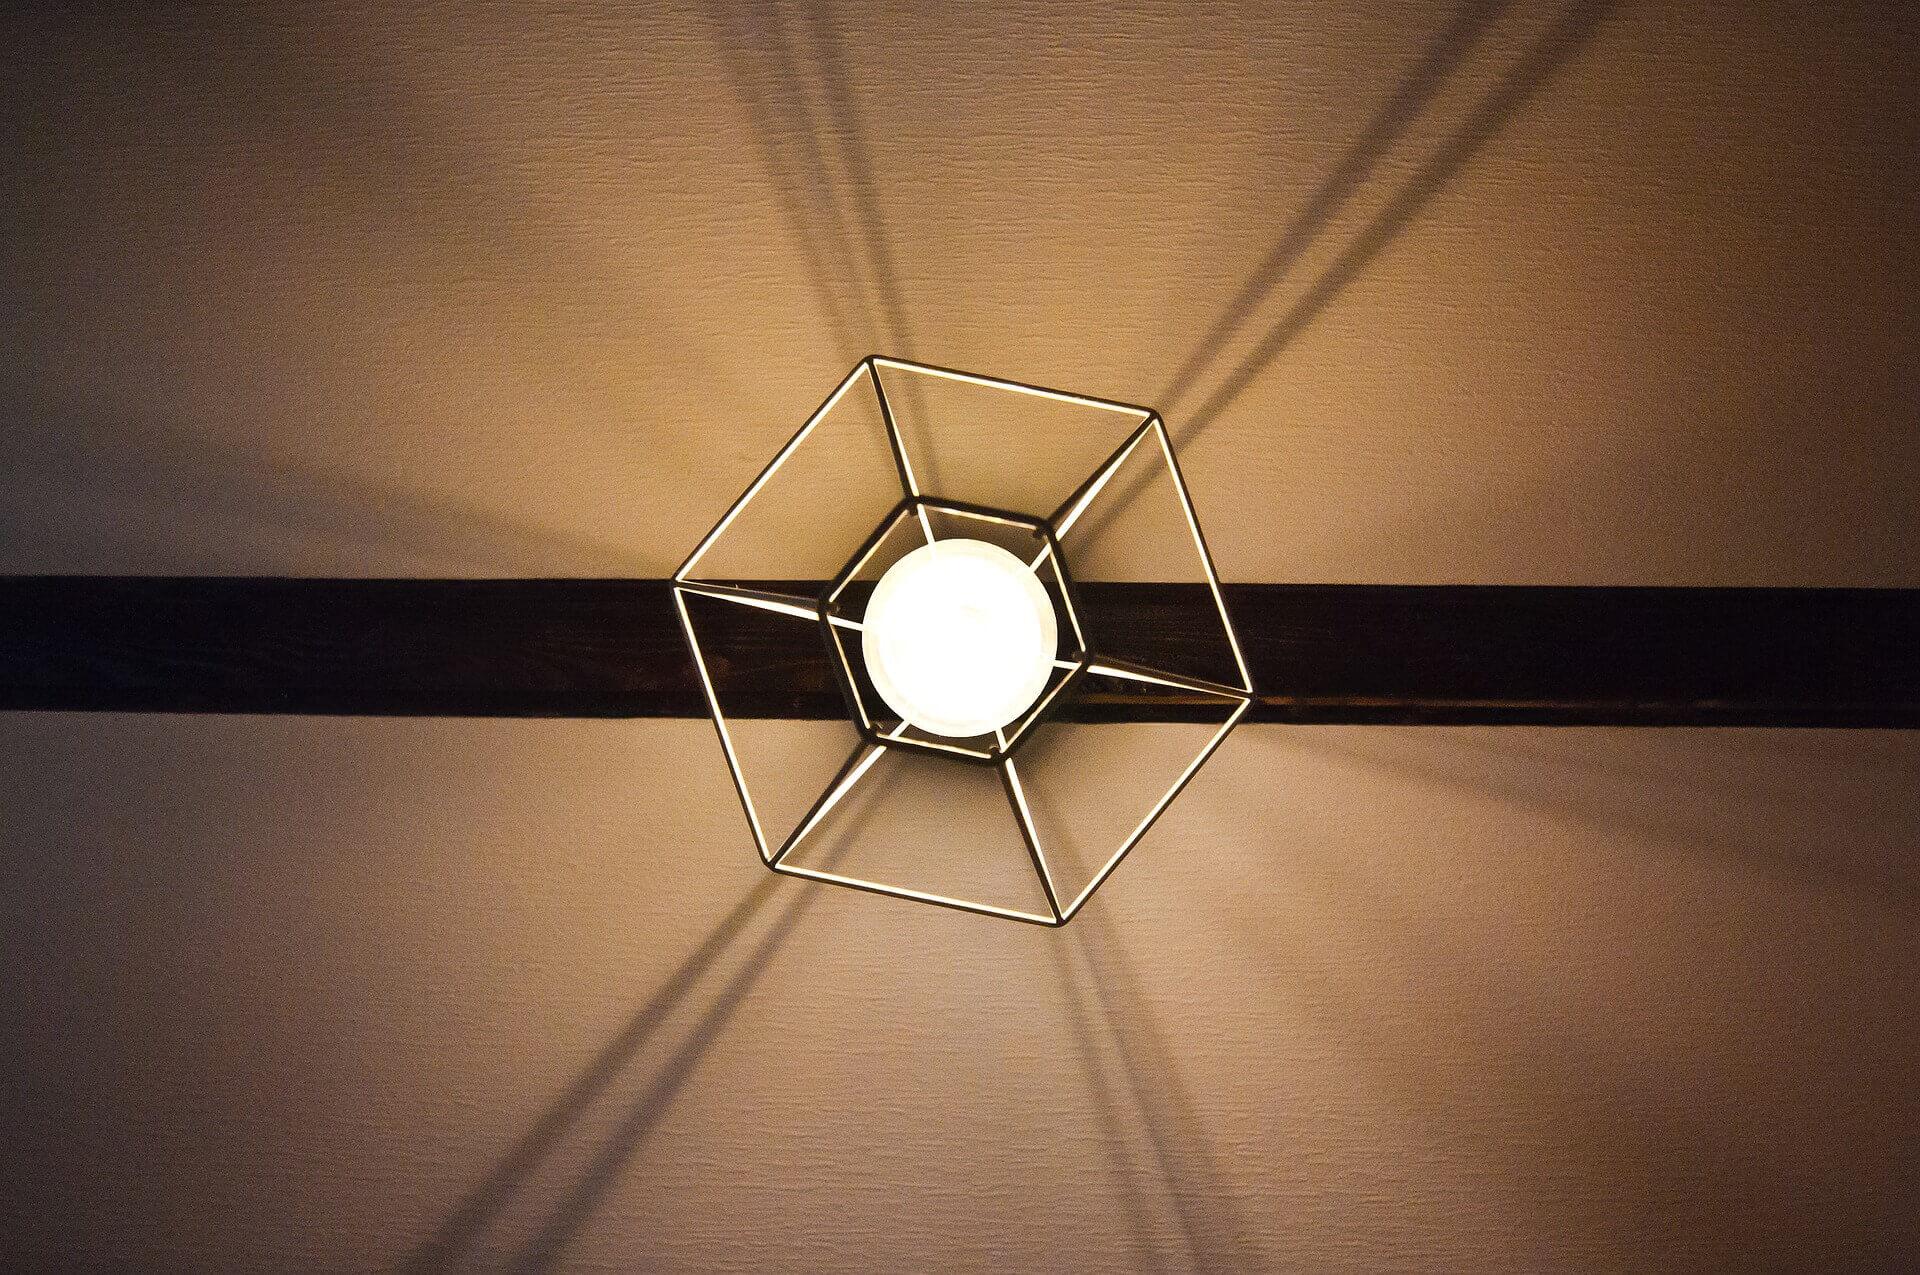 Zelf je lampen ophangen doe je zo